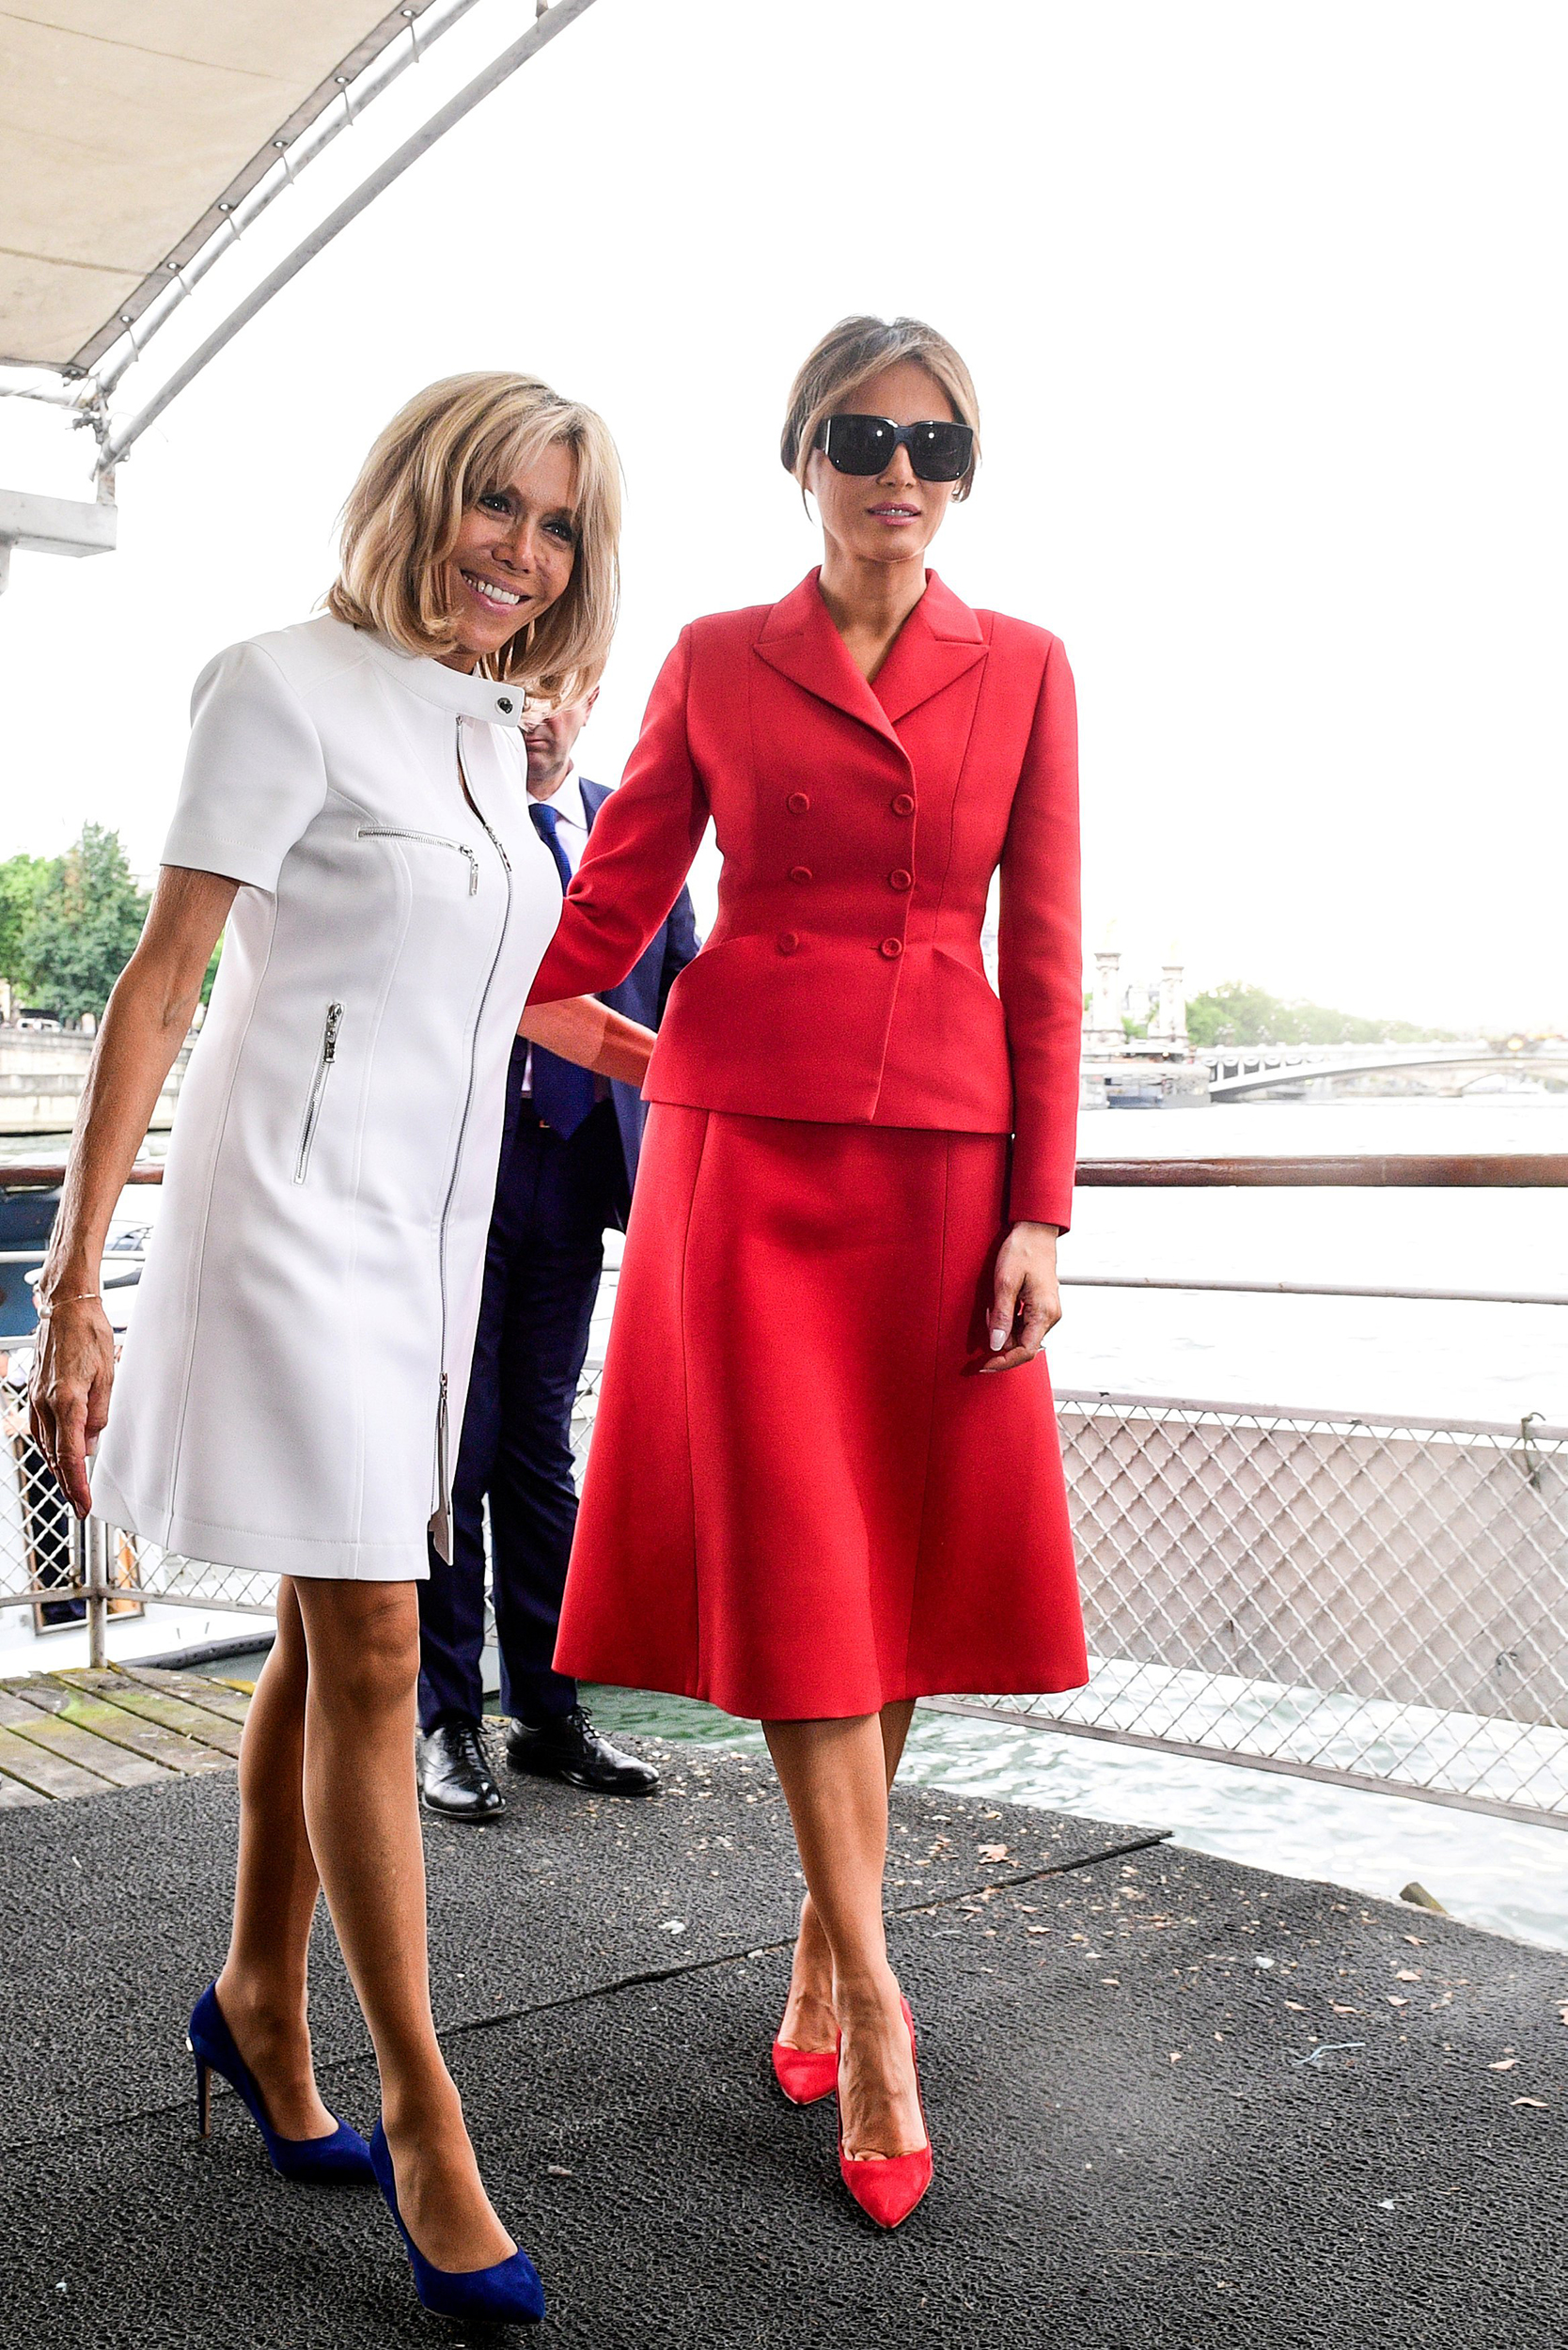 009b16c39b1 Melania Trump s first lady style